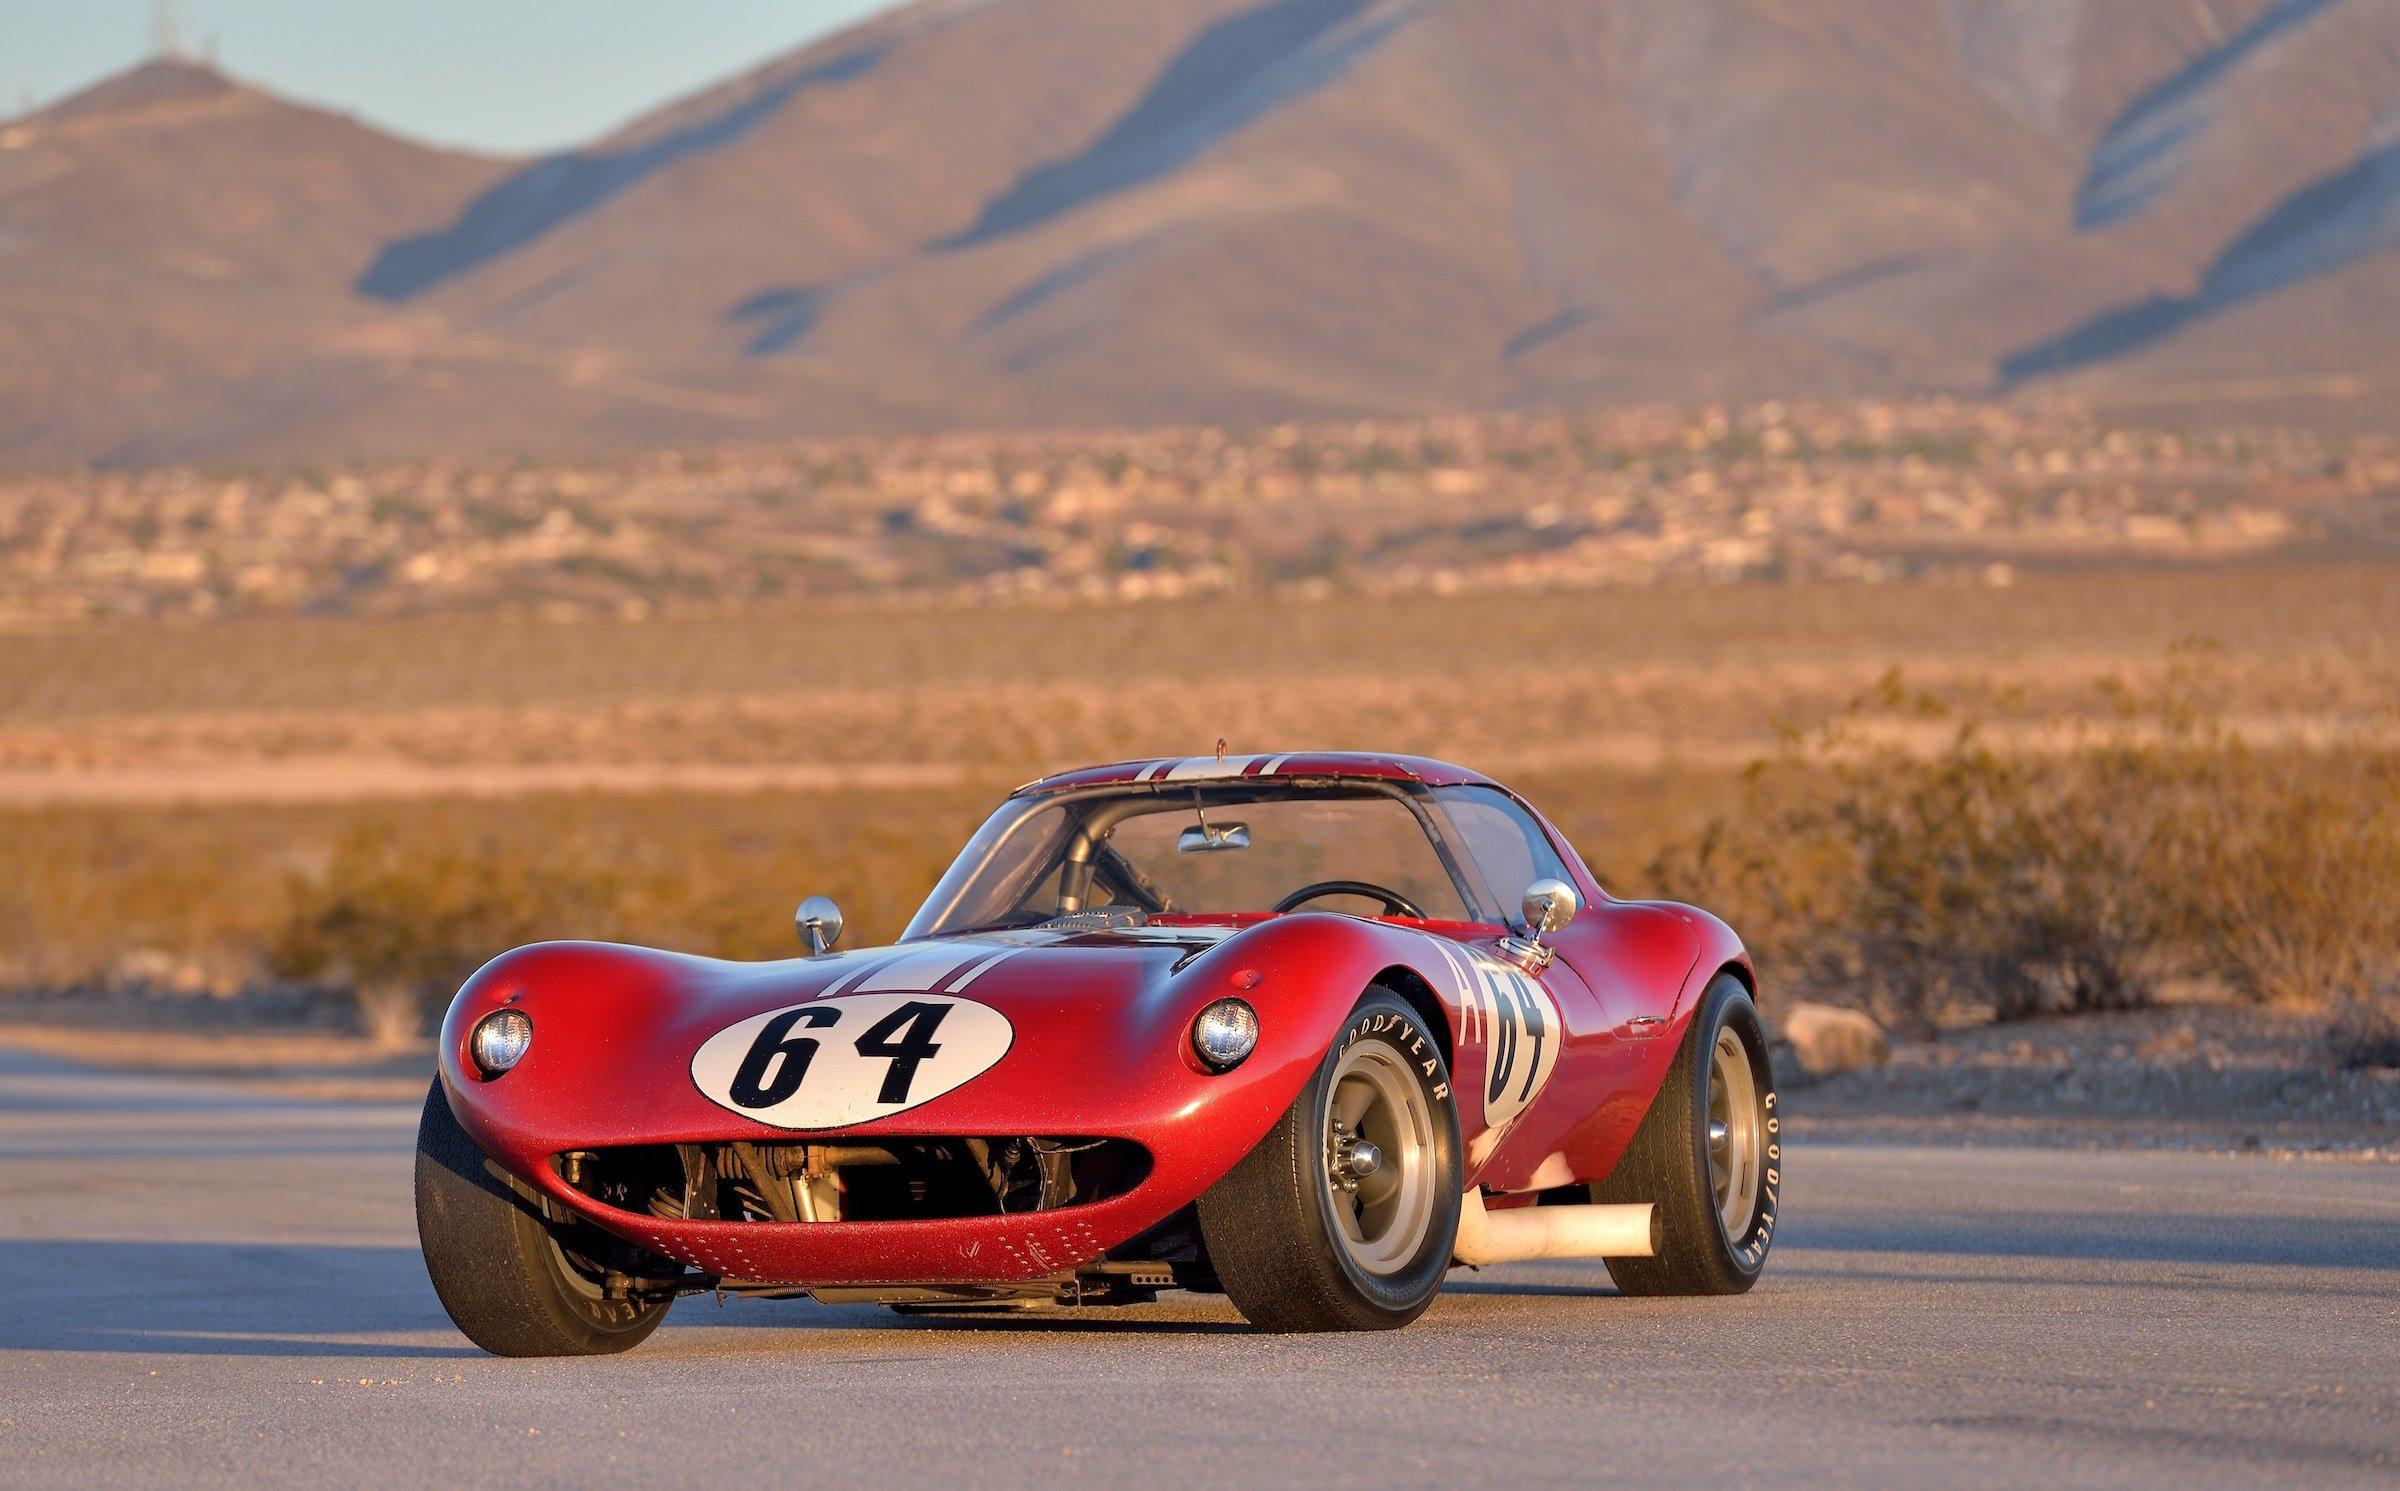 Bill Thomas Cheetah 4 The Race Car Designed In Chalk On A Garage Floor